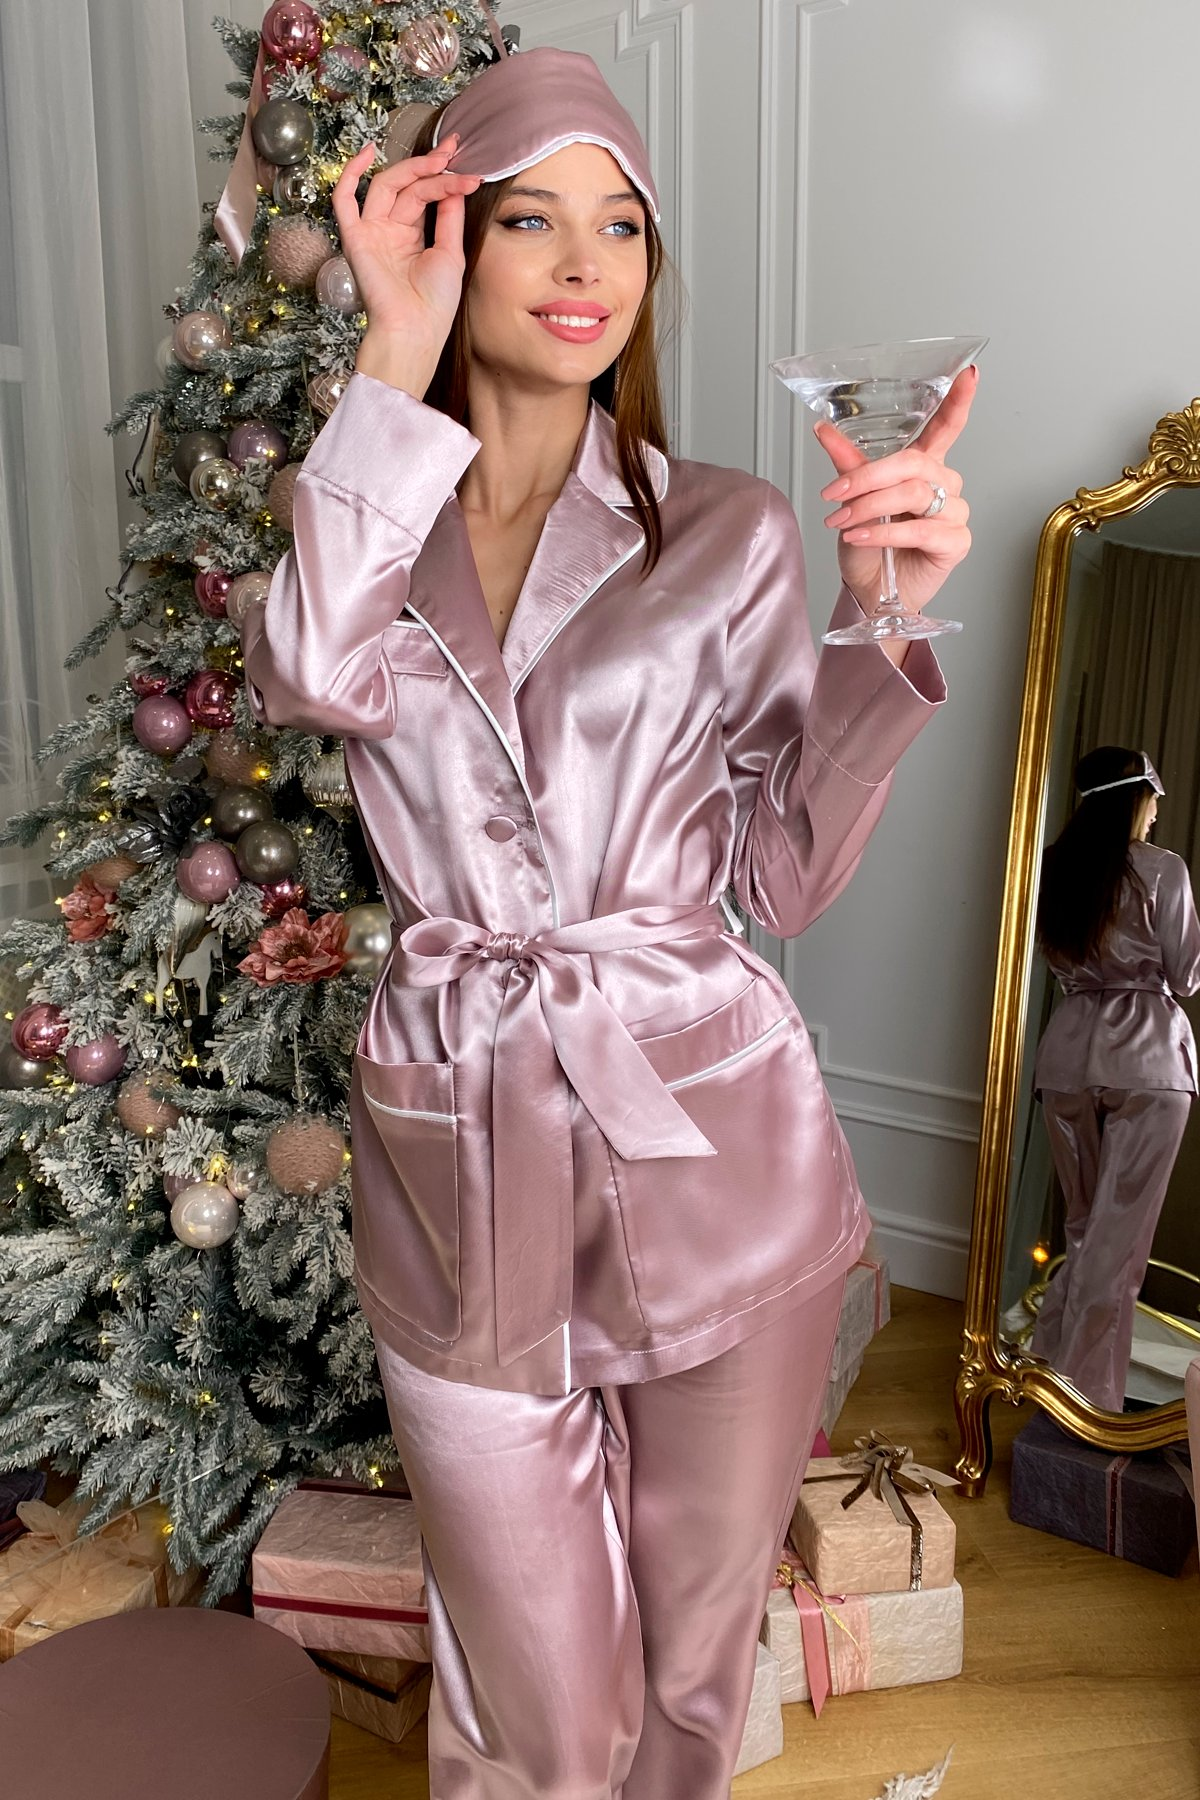 Шайн пижама из шелка 10446 АРТ. 46759 Цвет: Пудра - фото 6, интернет магазин tm-modus.ru